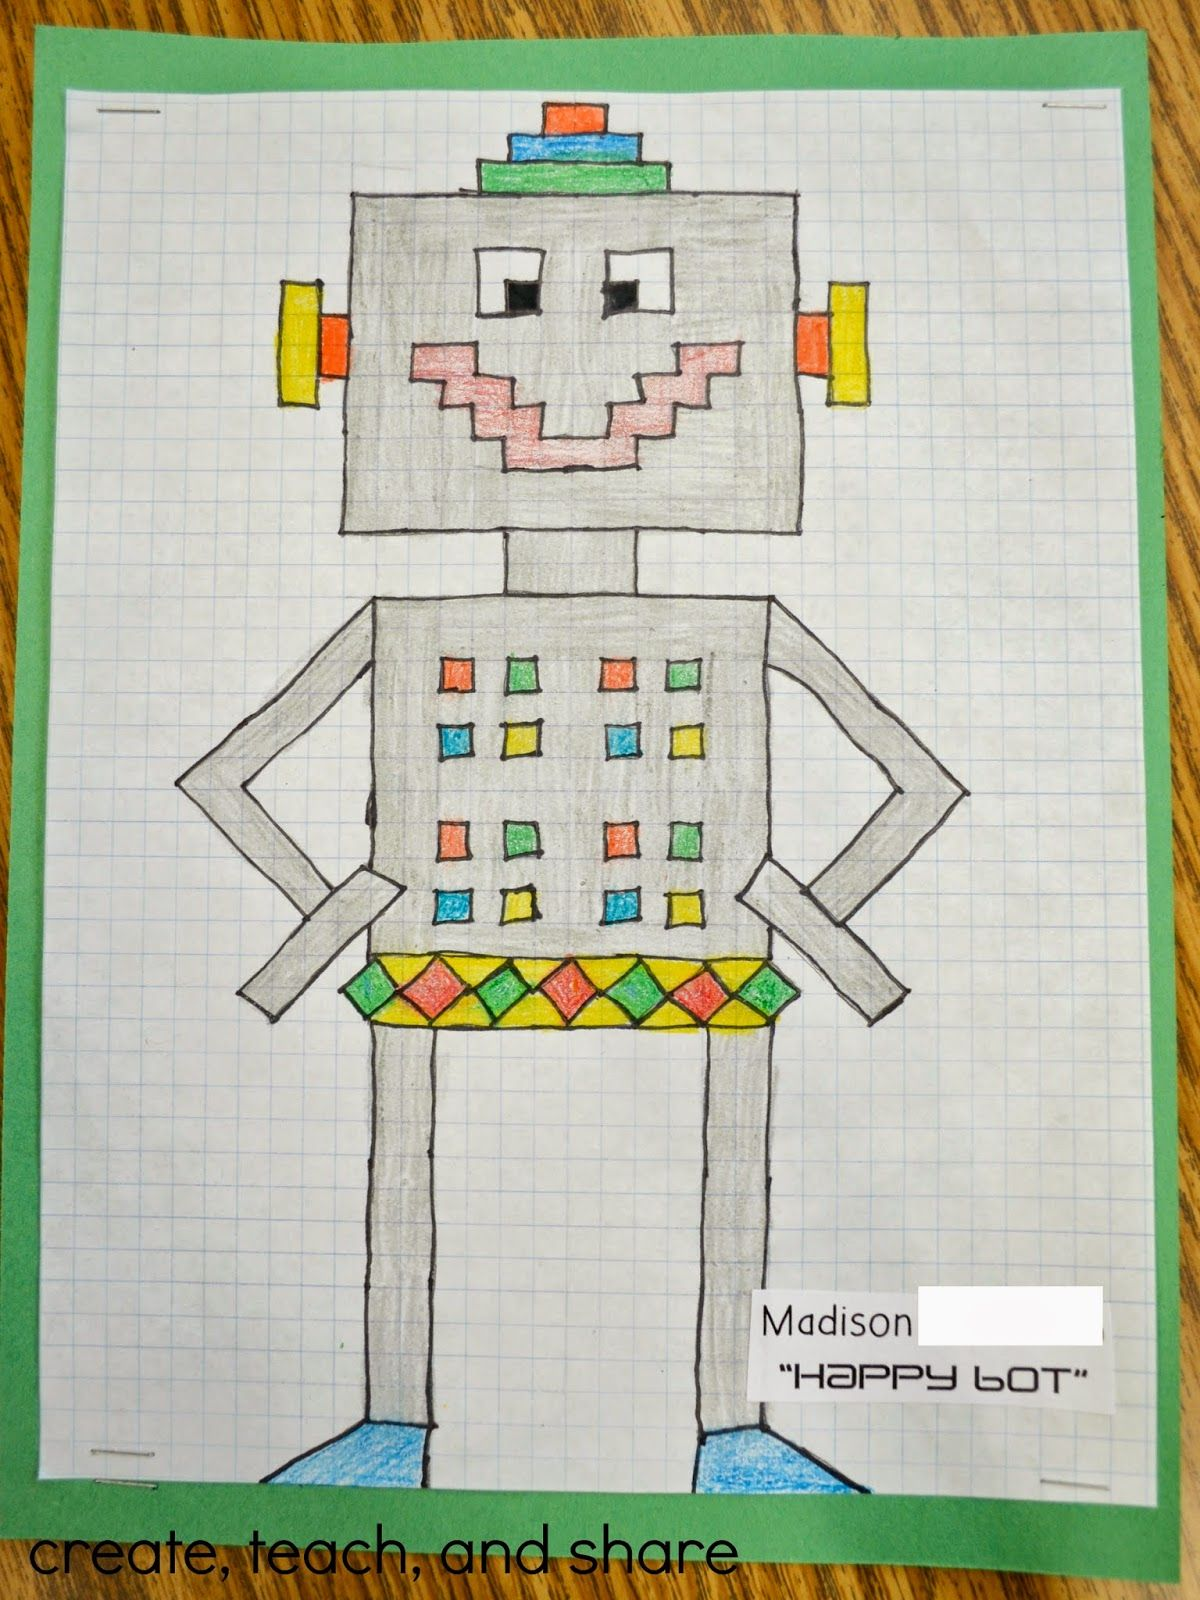 elementary graphing paper - Etame.mibawa.co